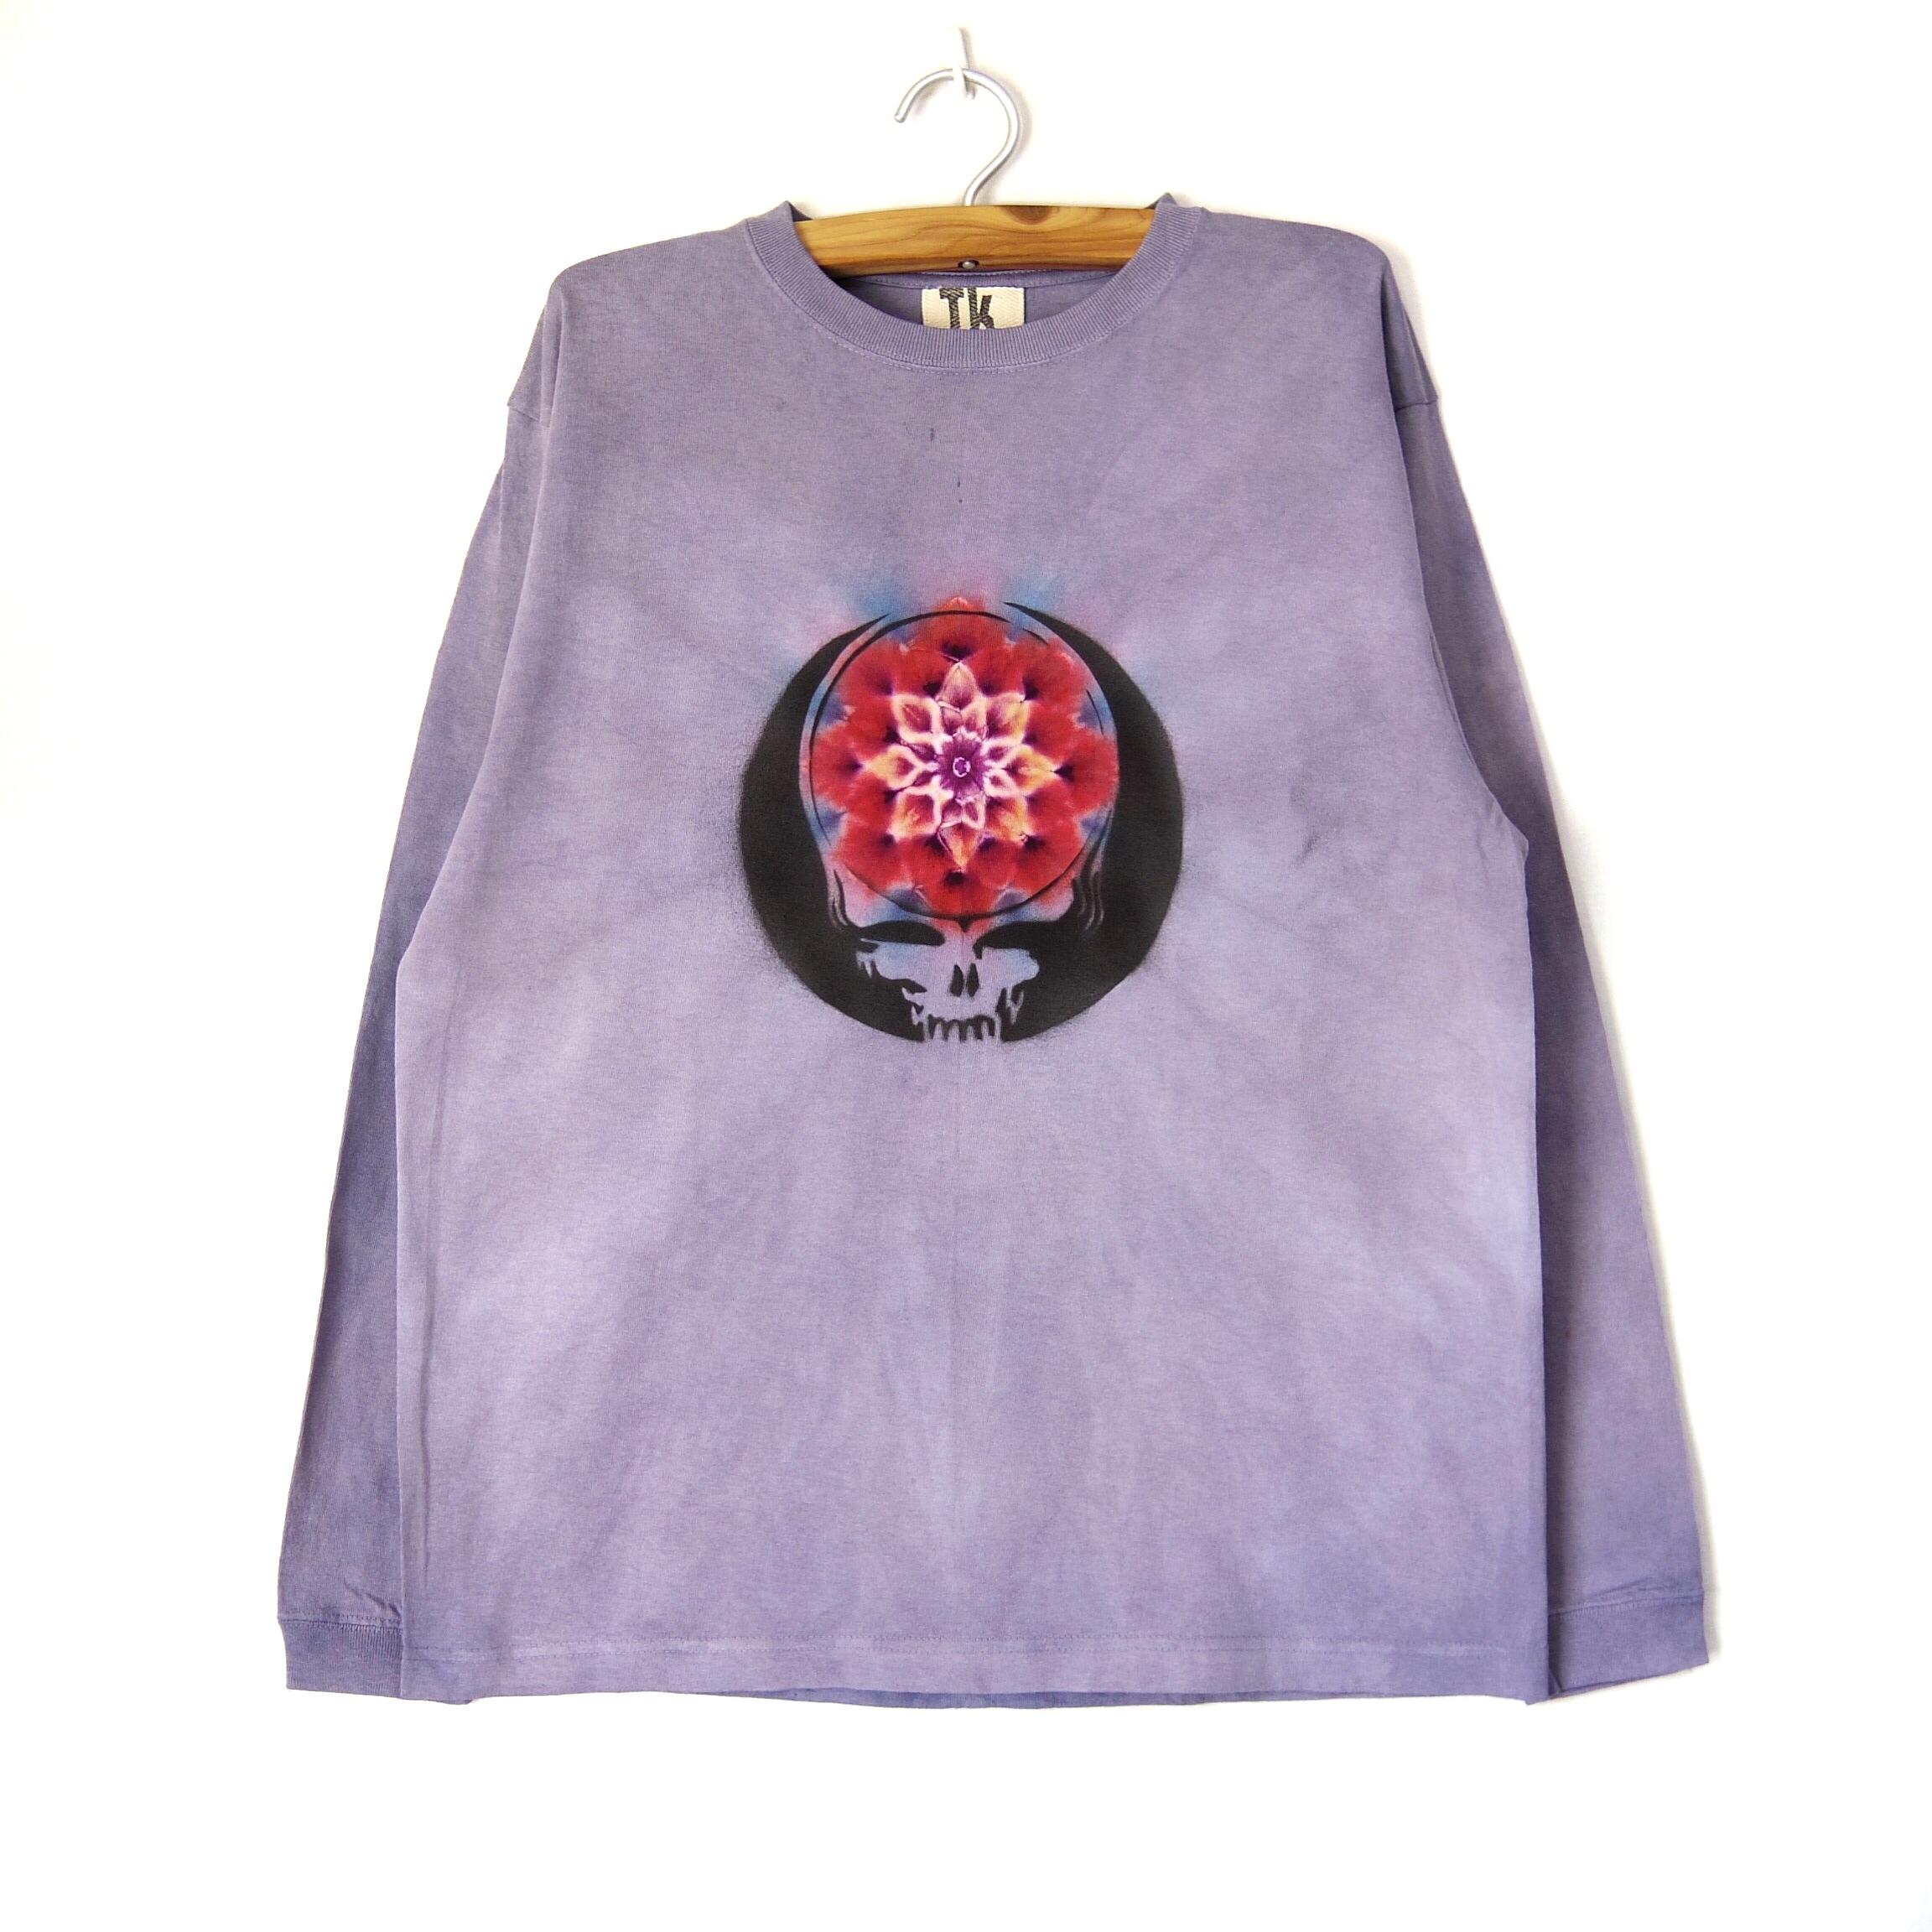 TKHOMEFACTORY × グレイトフルデッド 曼荼羅染め ロングTシャツ L